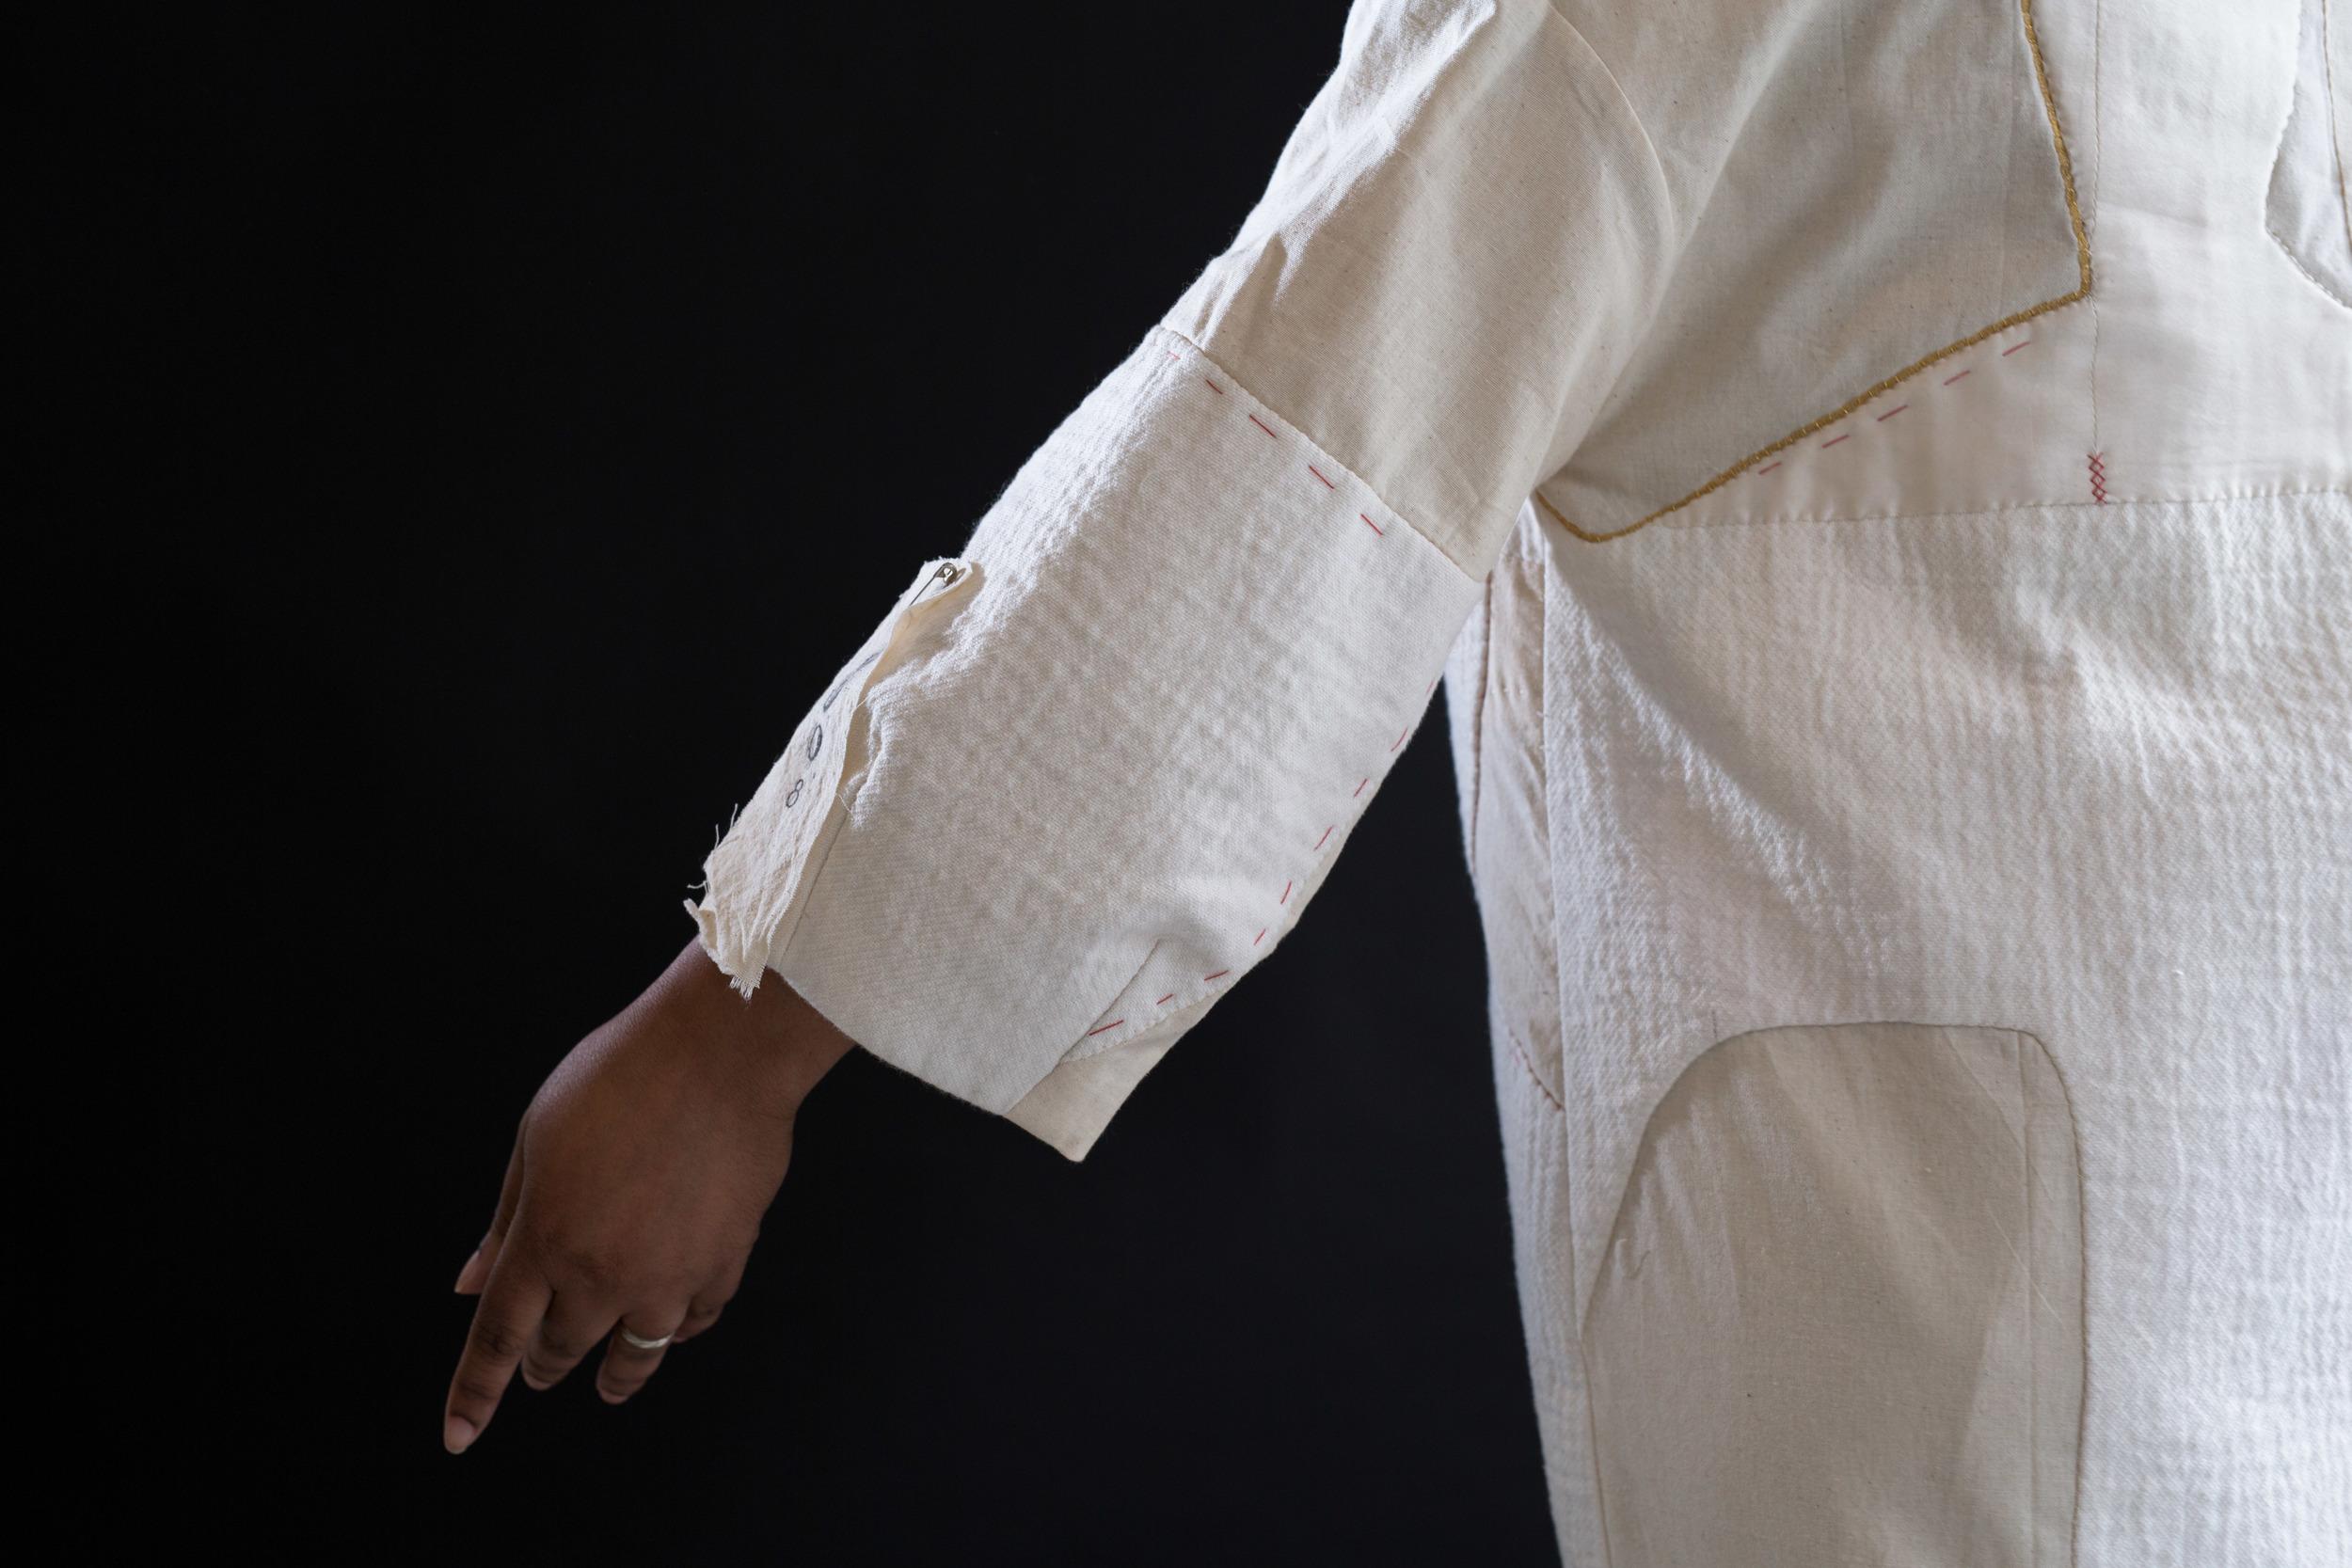 zero-waste-apparel-s02-002.jpg